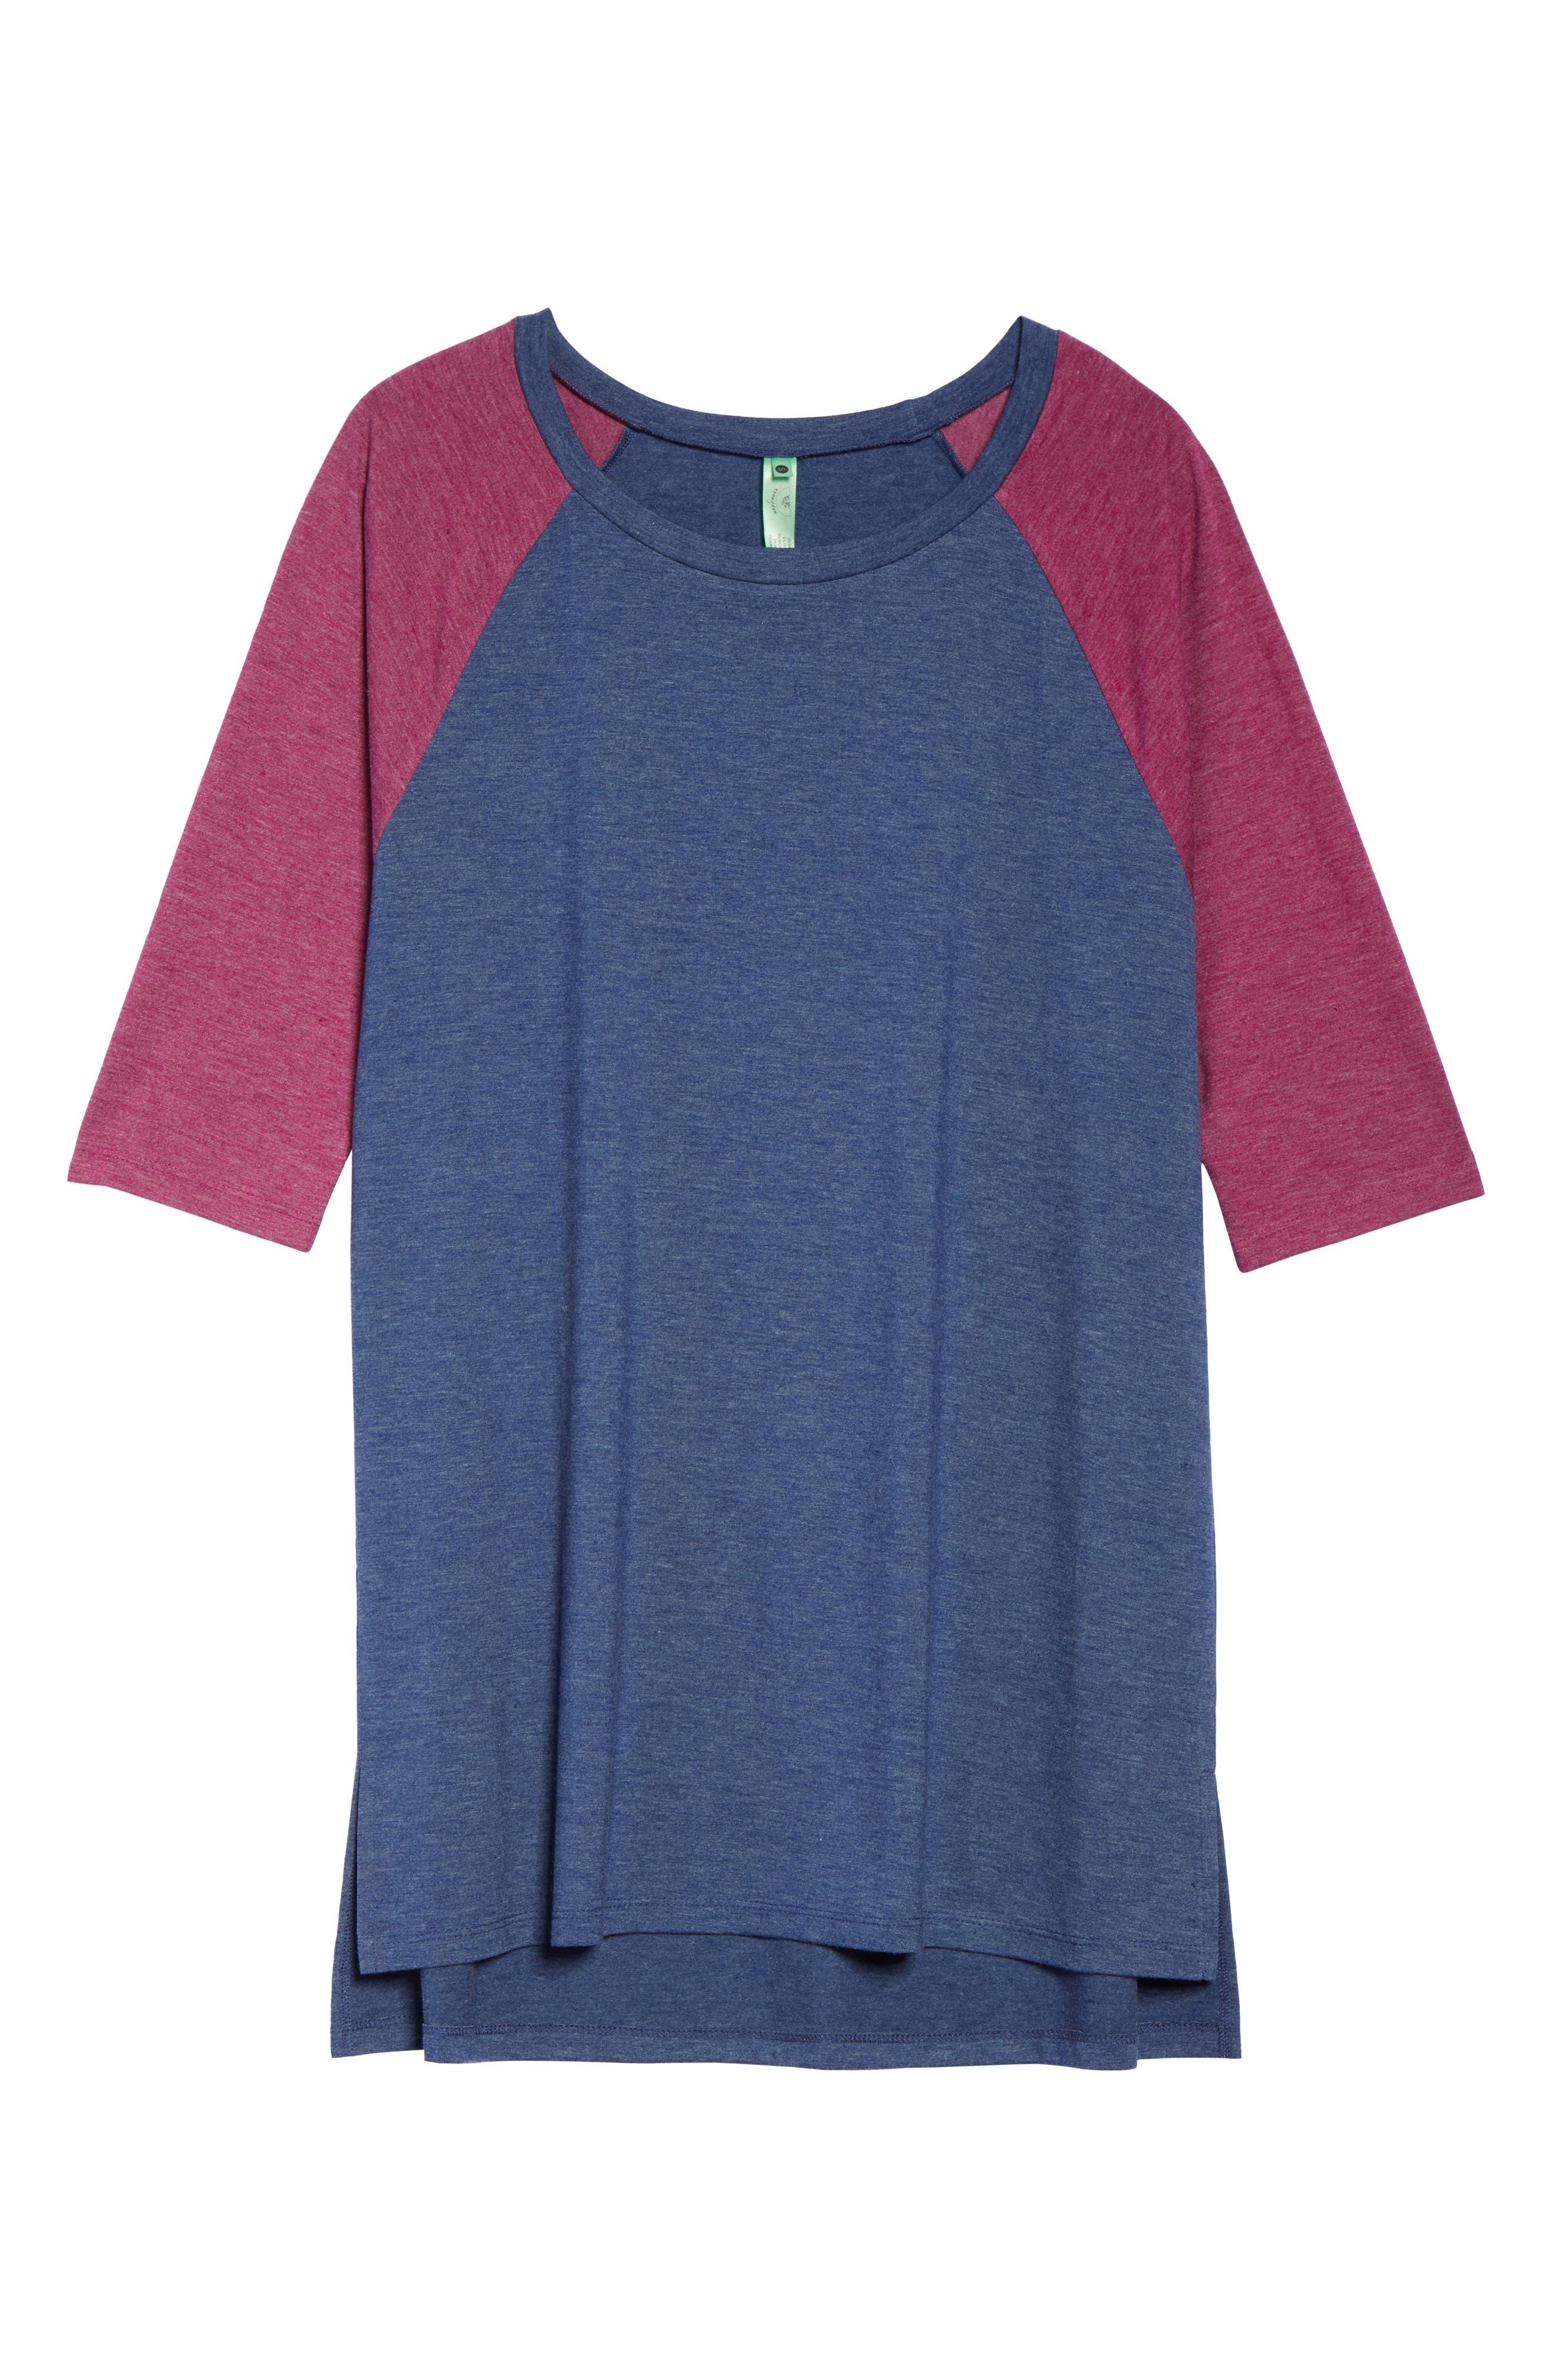 Honeydew All American Sleep Shirt,                             Alternate thumbnail 40, color,